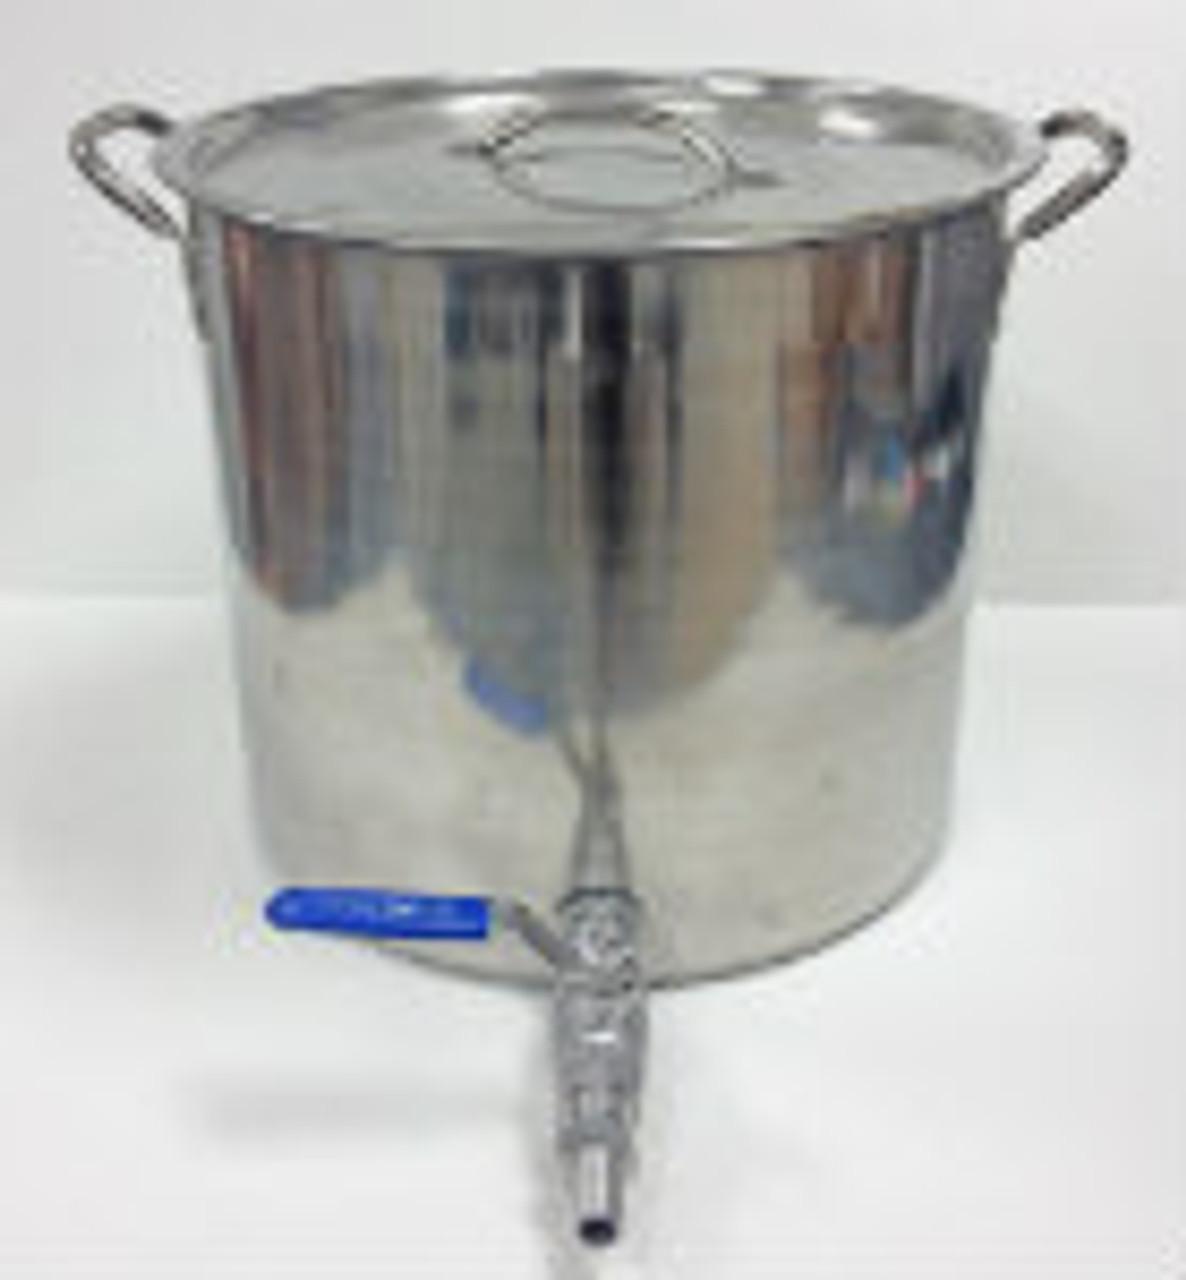 5 Gallon Stainless Steel Stock Pot With Weldless Ball Valve